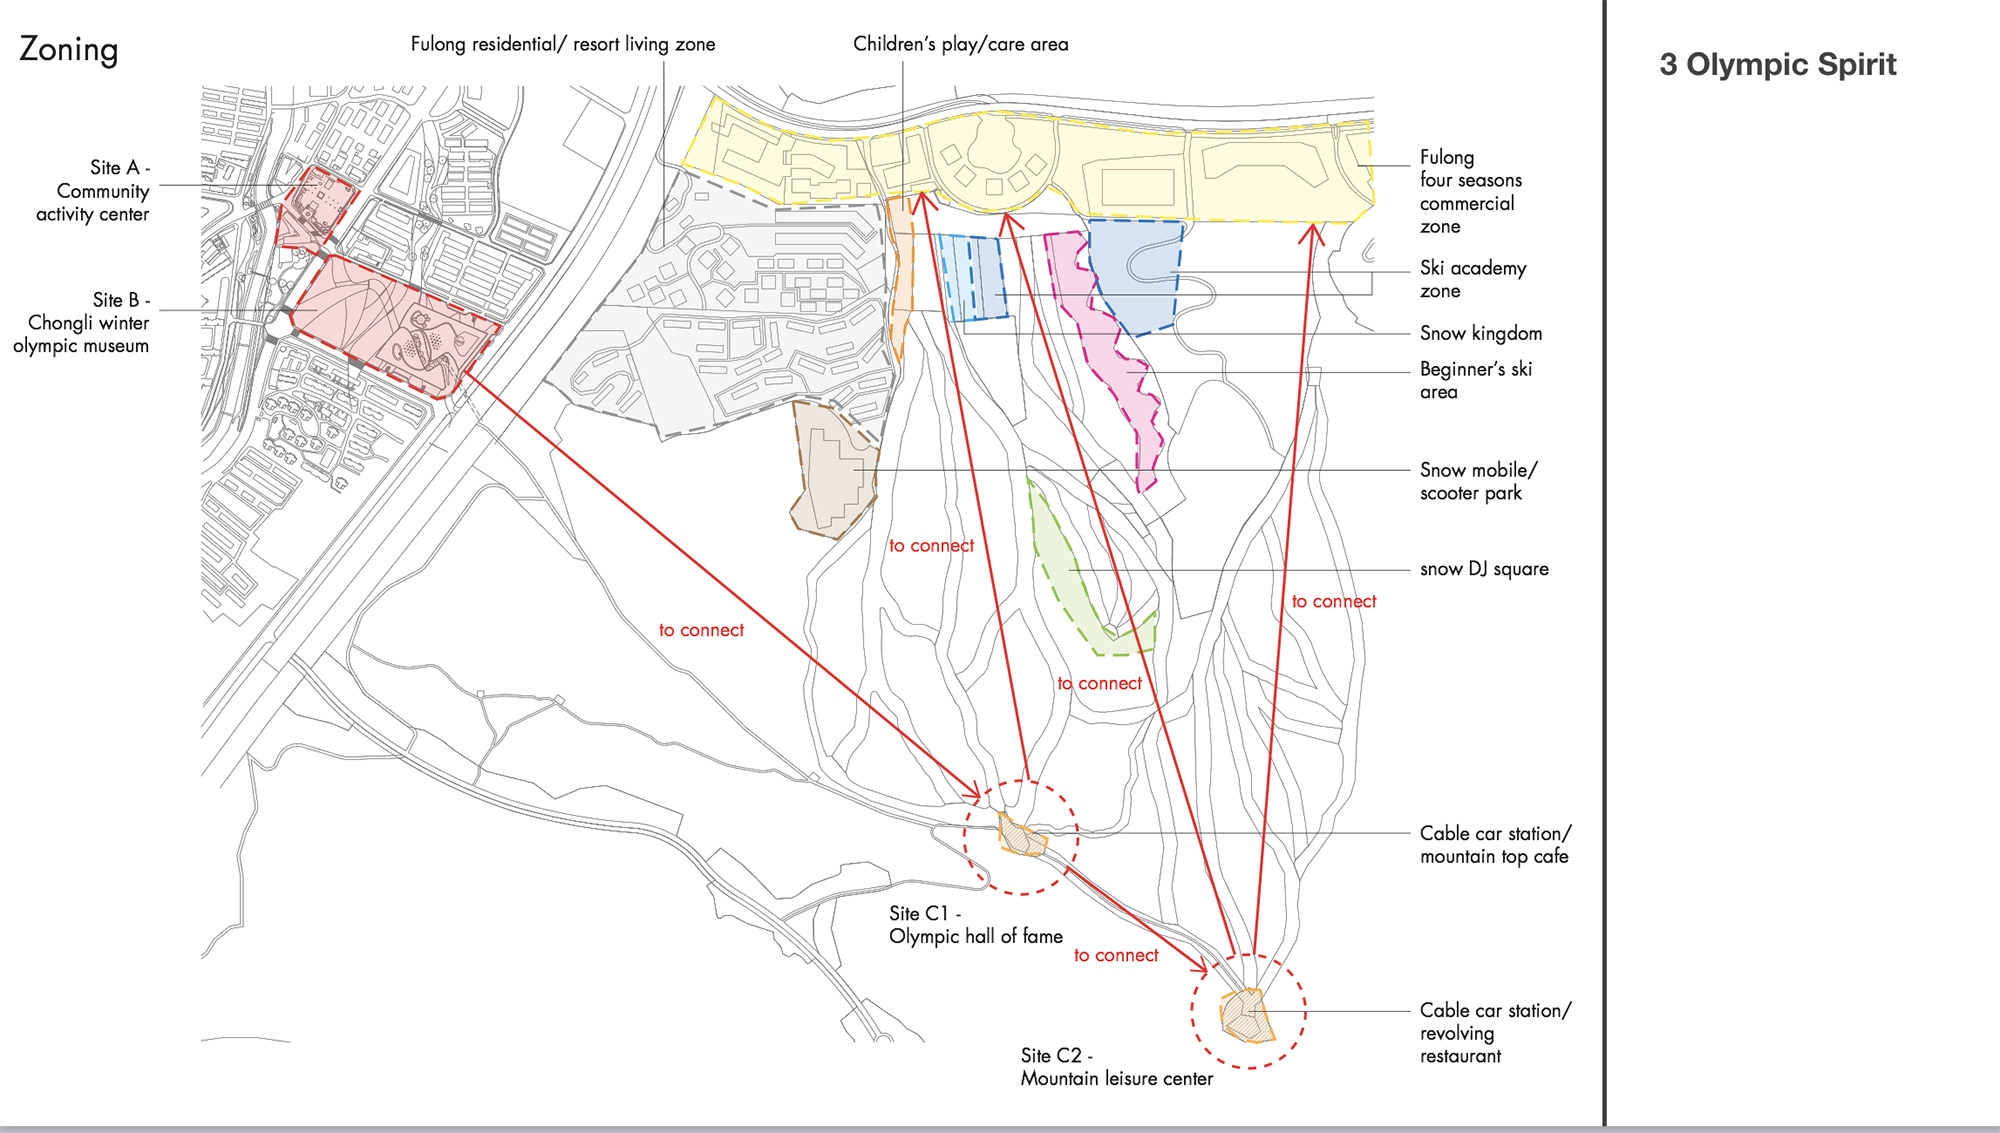 Planimetria del territorio. PH: maisonh.nl